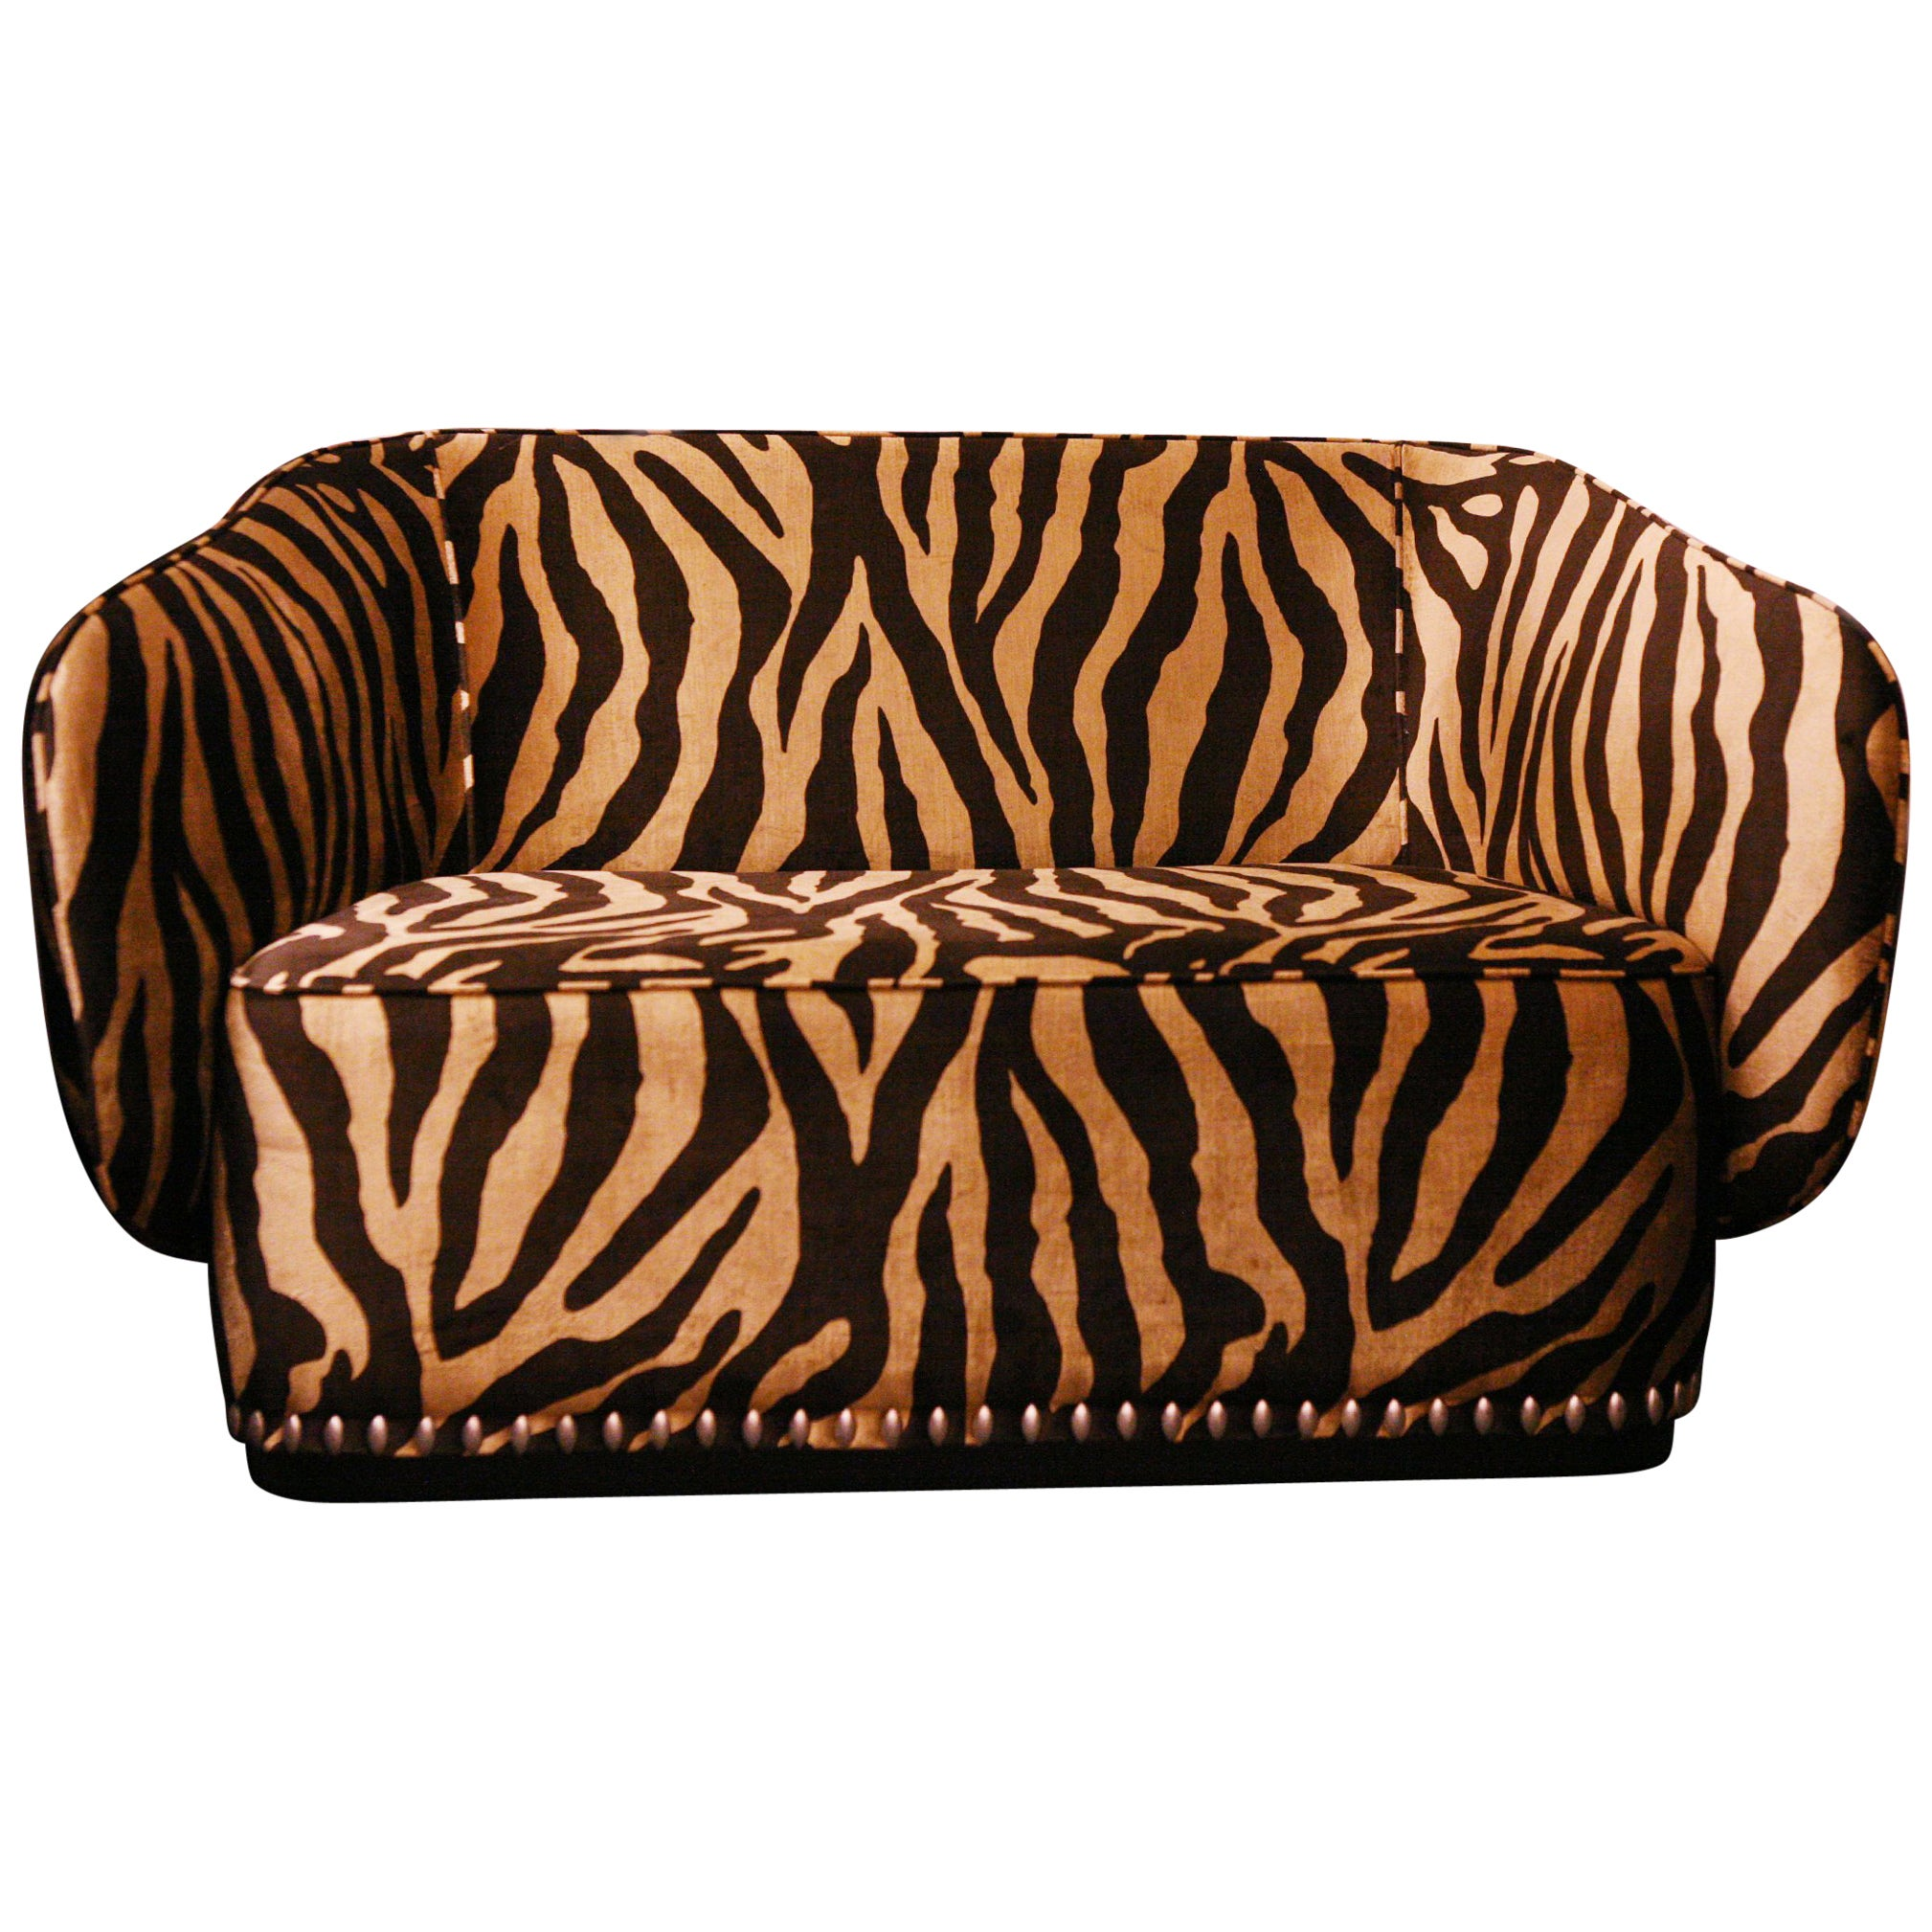 Zebra Gold Sofa in Velvet Fabric